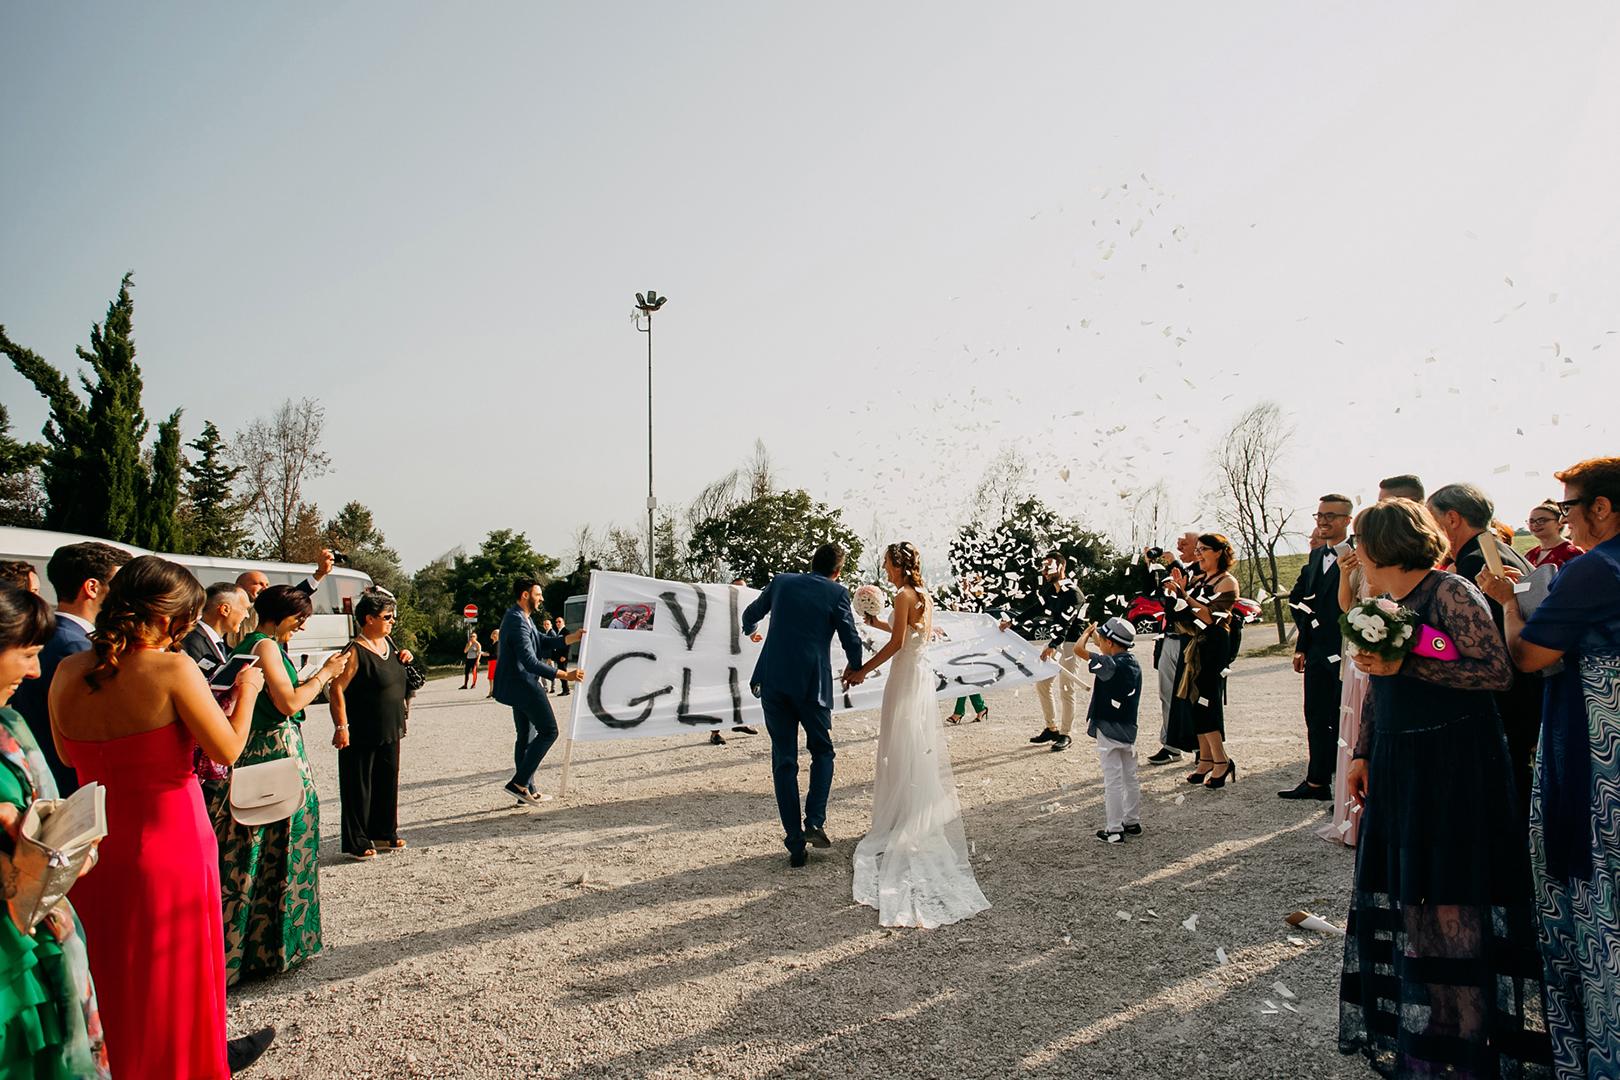 39 gianni-lepore-fotografo-matrimonio-uscita-chiesa-sposi-silvi